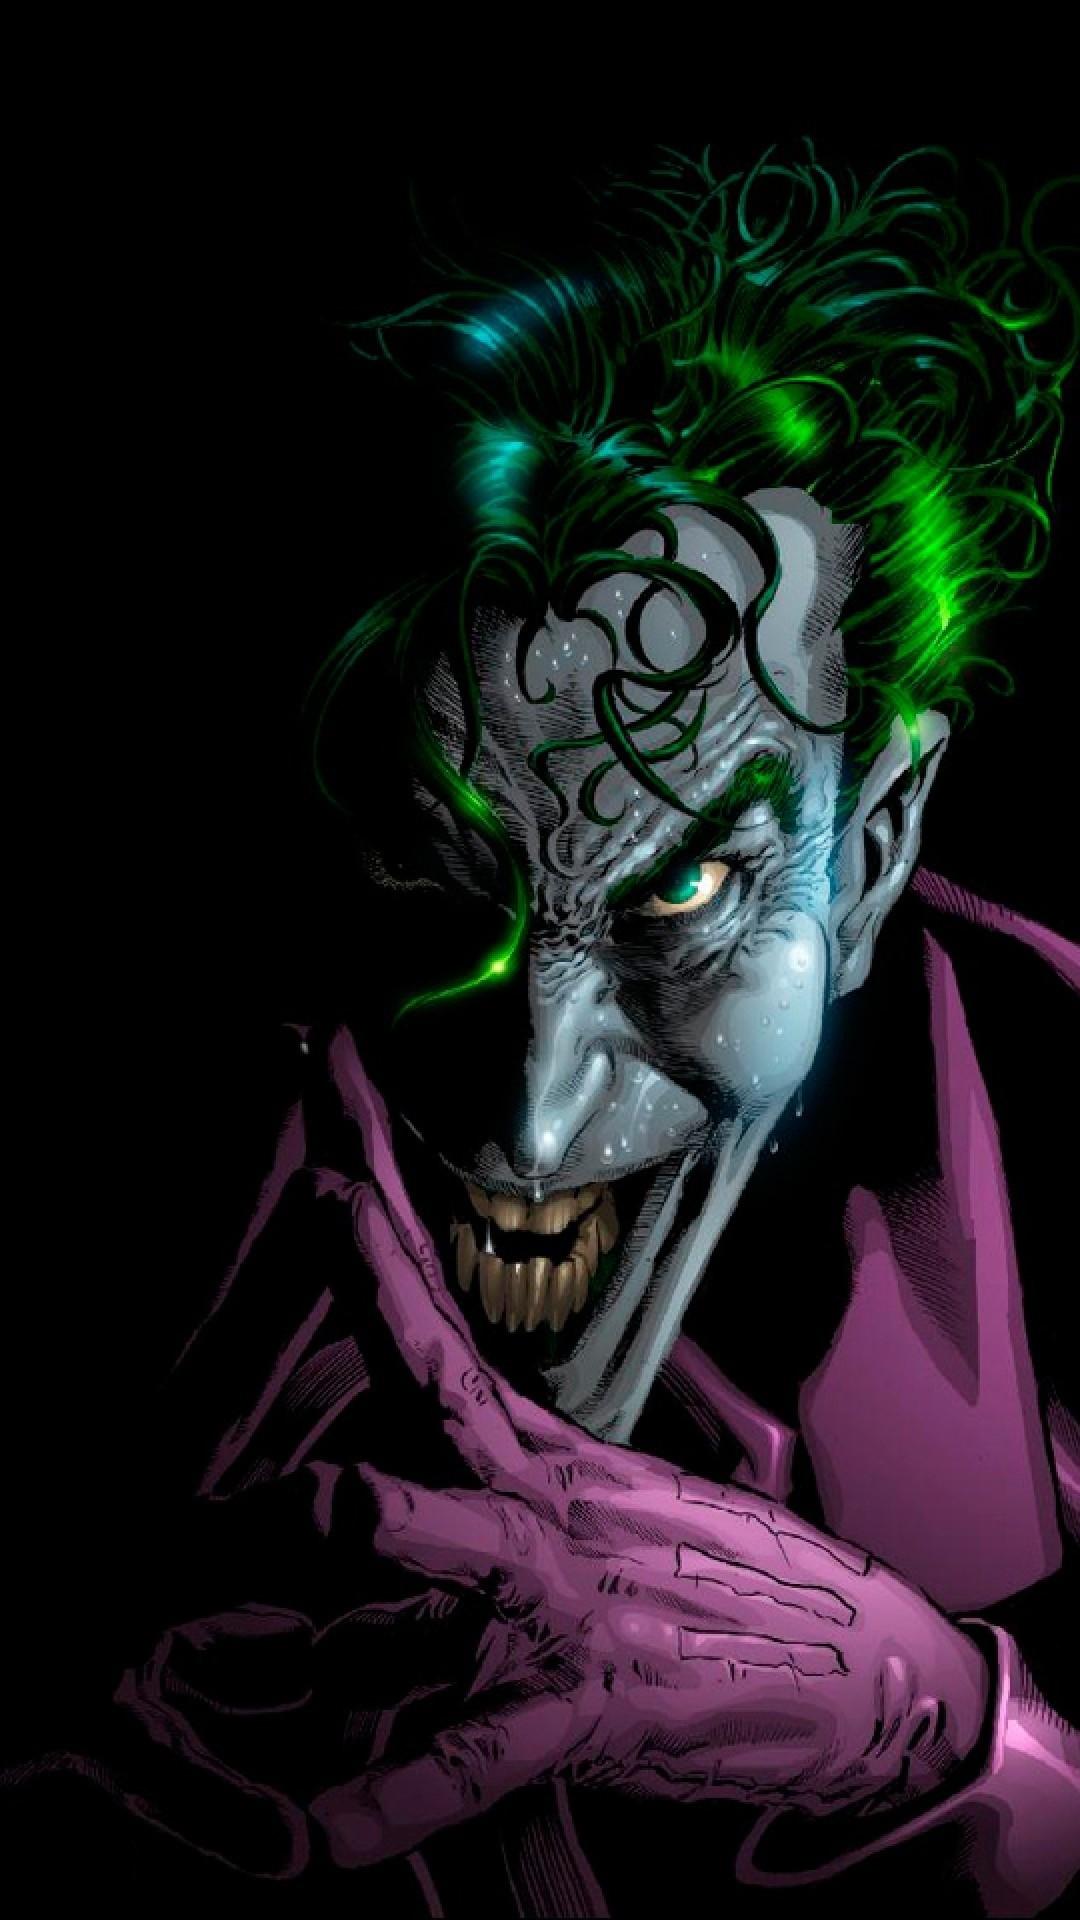 Joker Cartoon Iphone 4 Wallpaper 4Iphonewallpapers Com